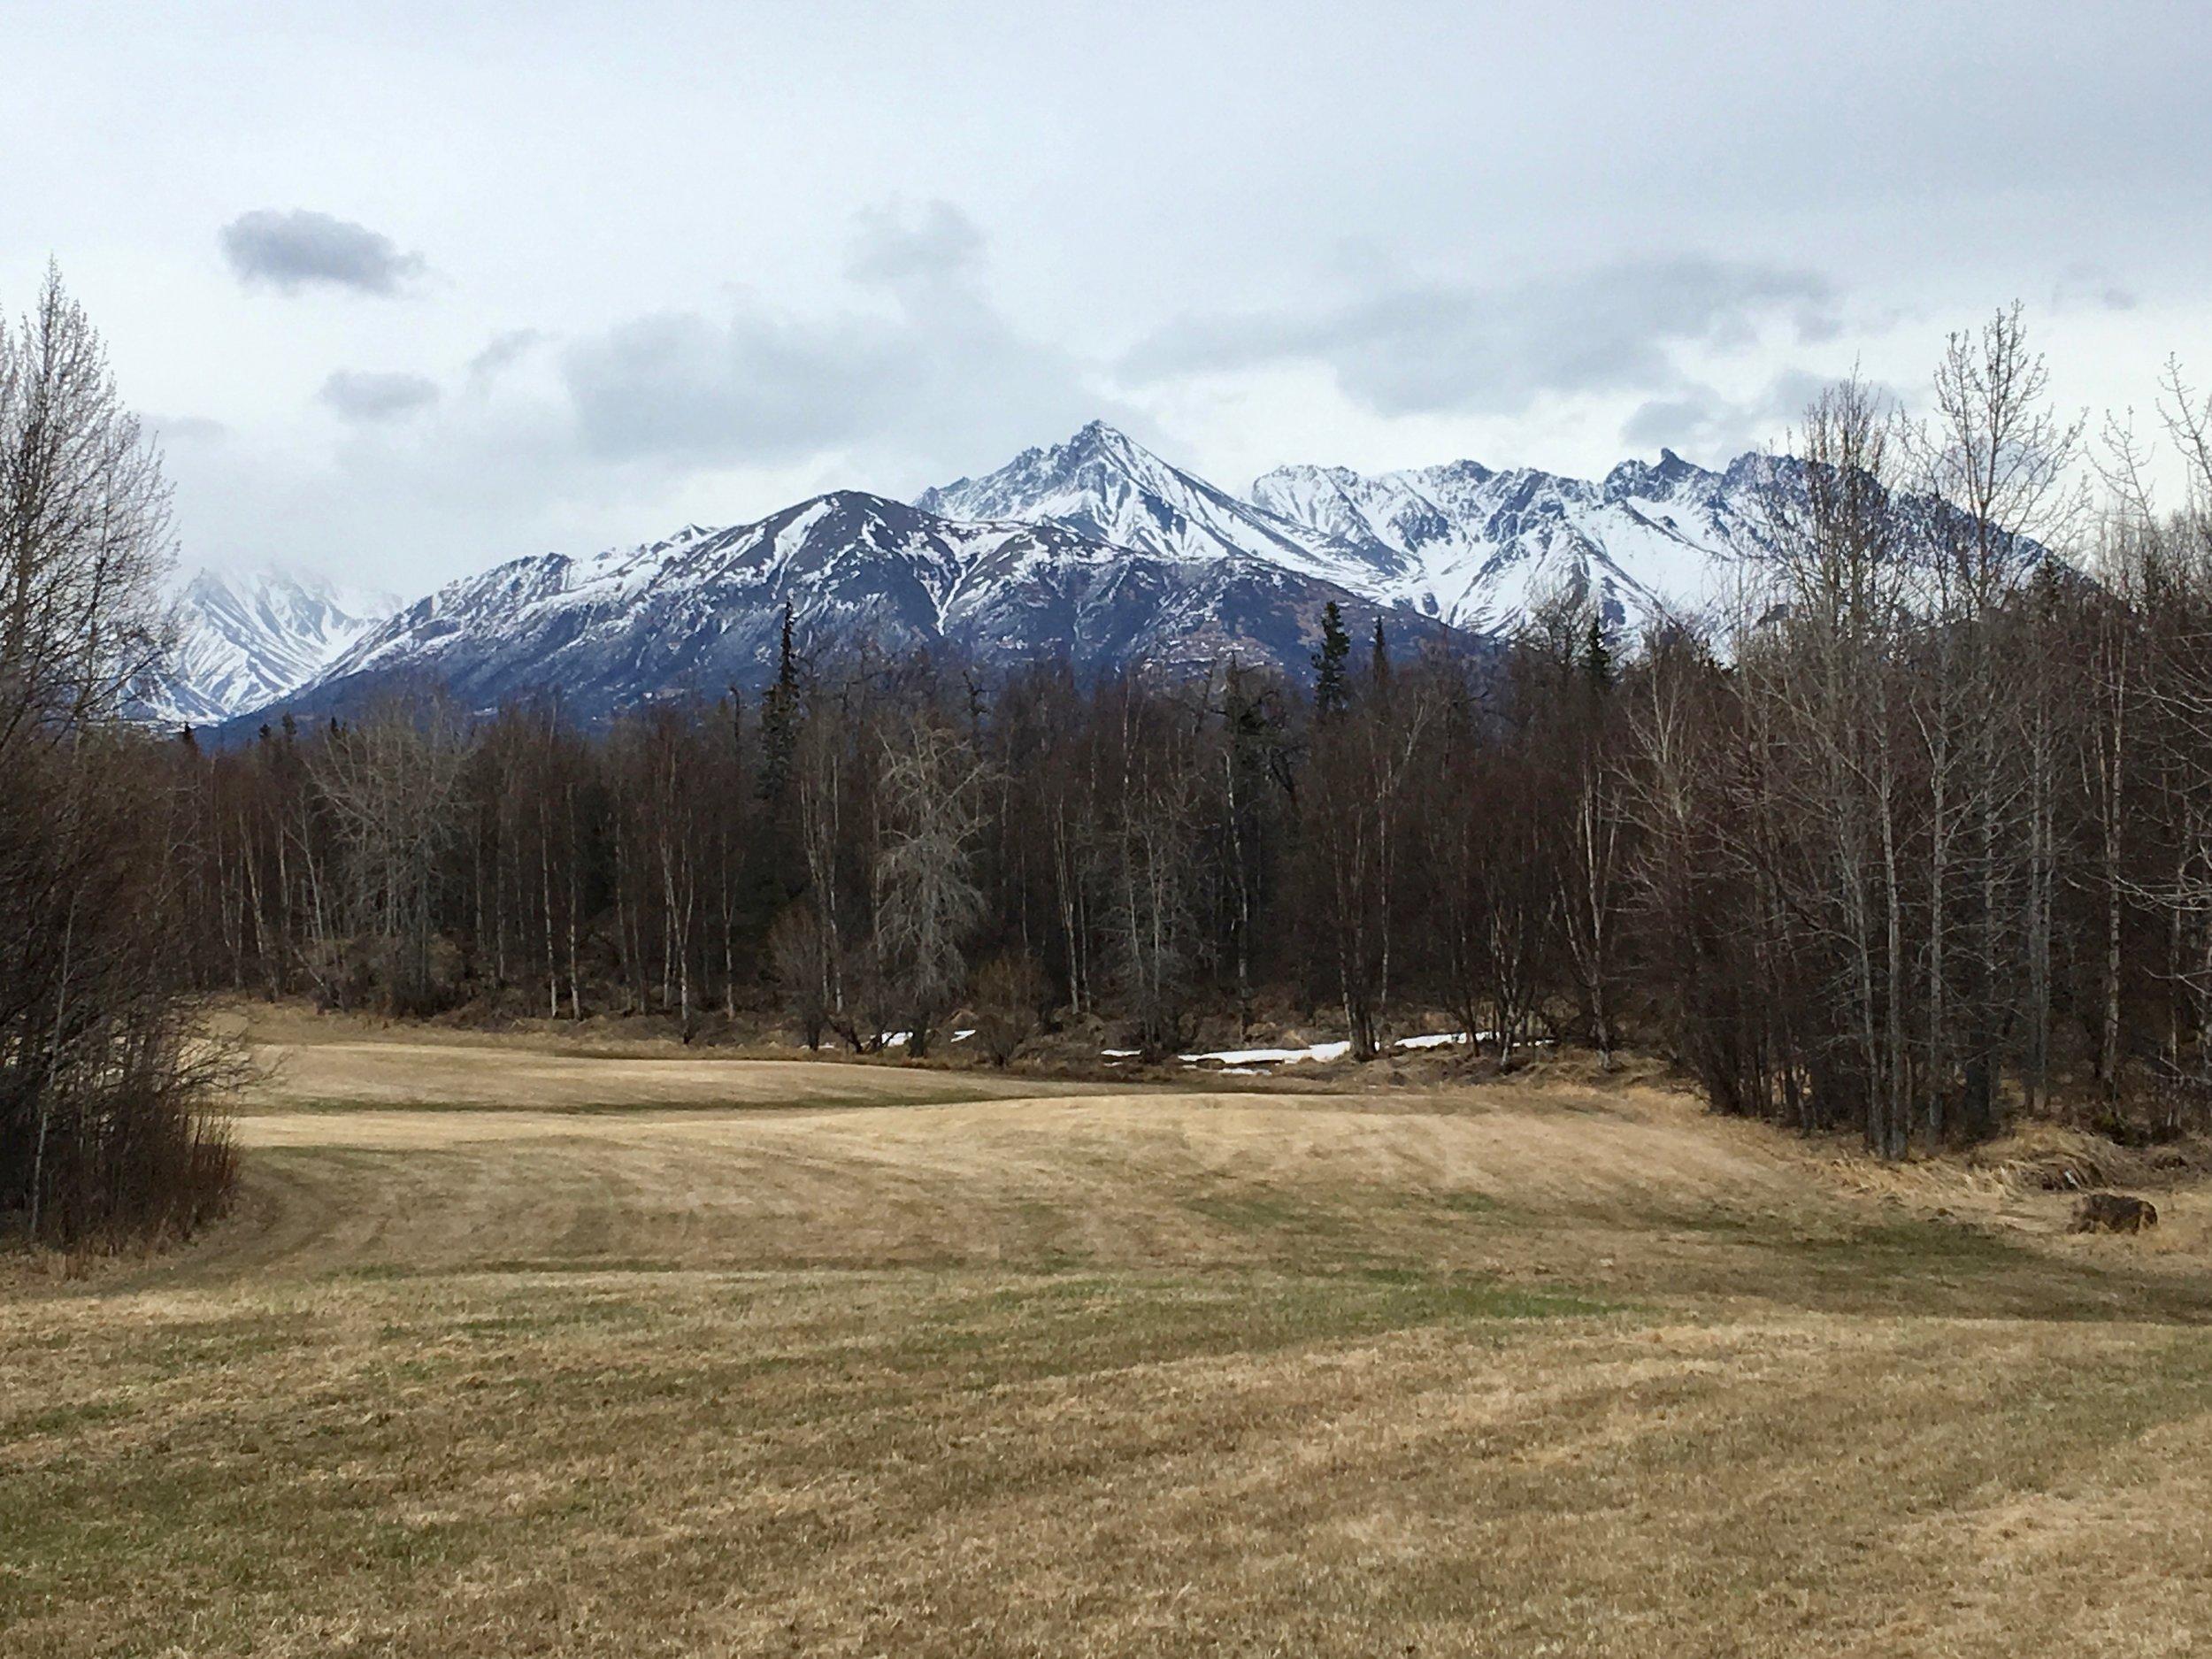 Alaska can take your breathe away!